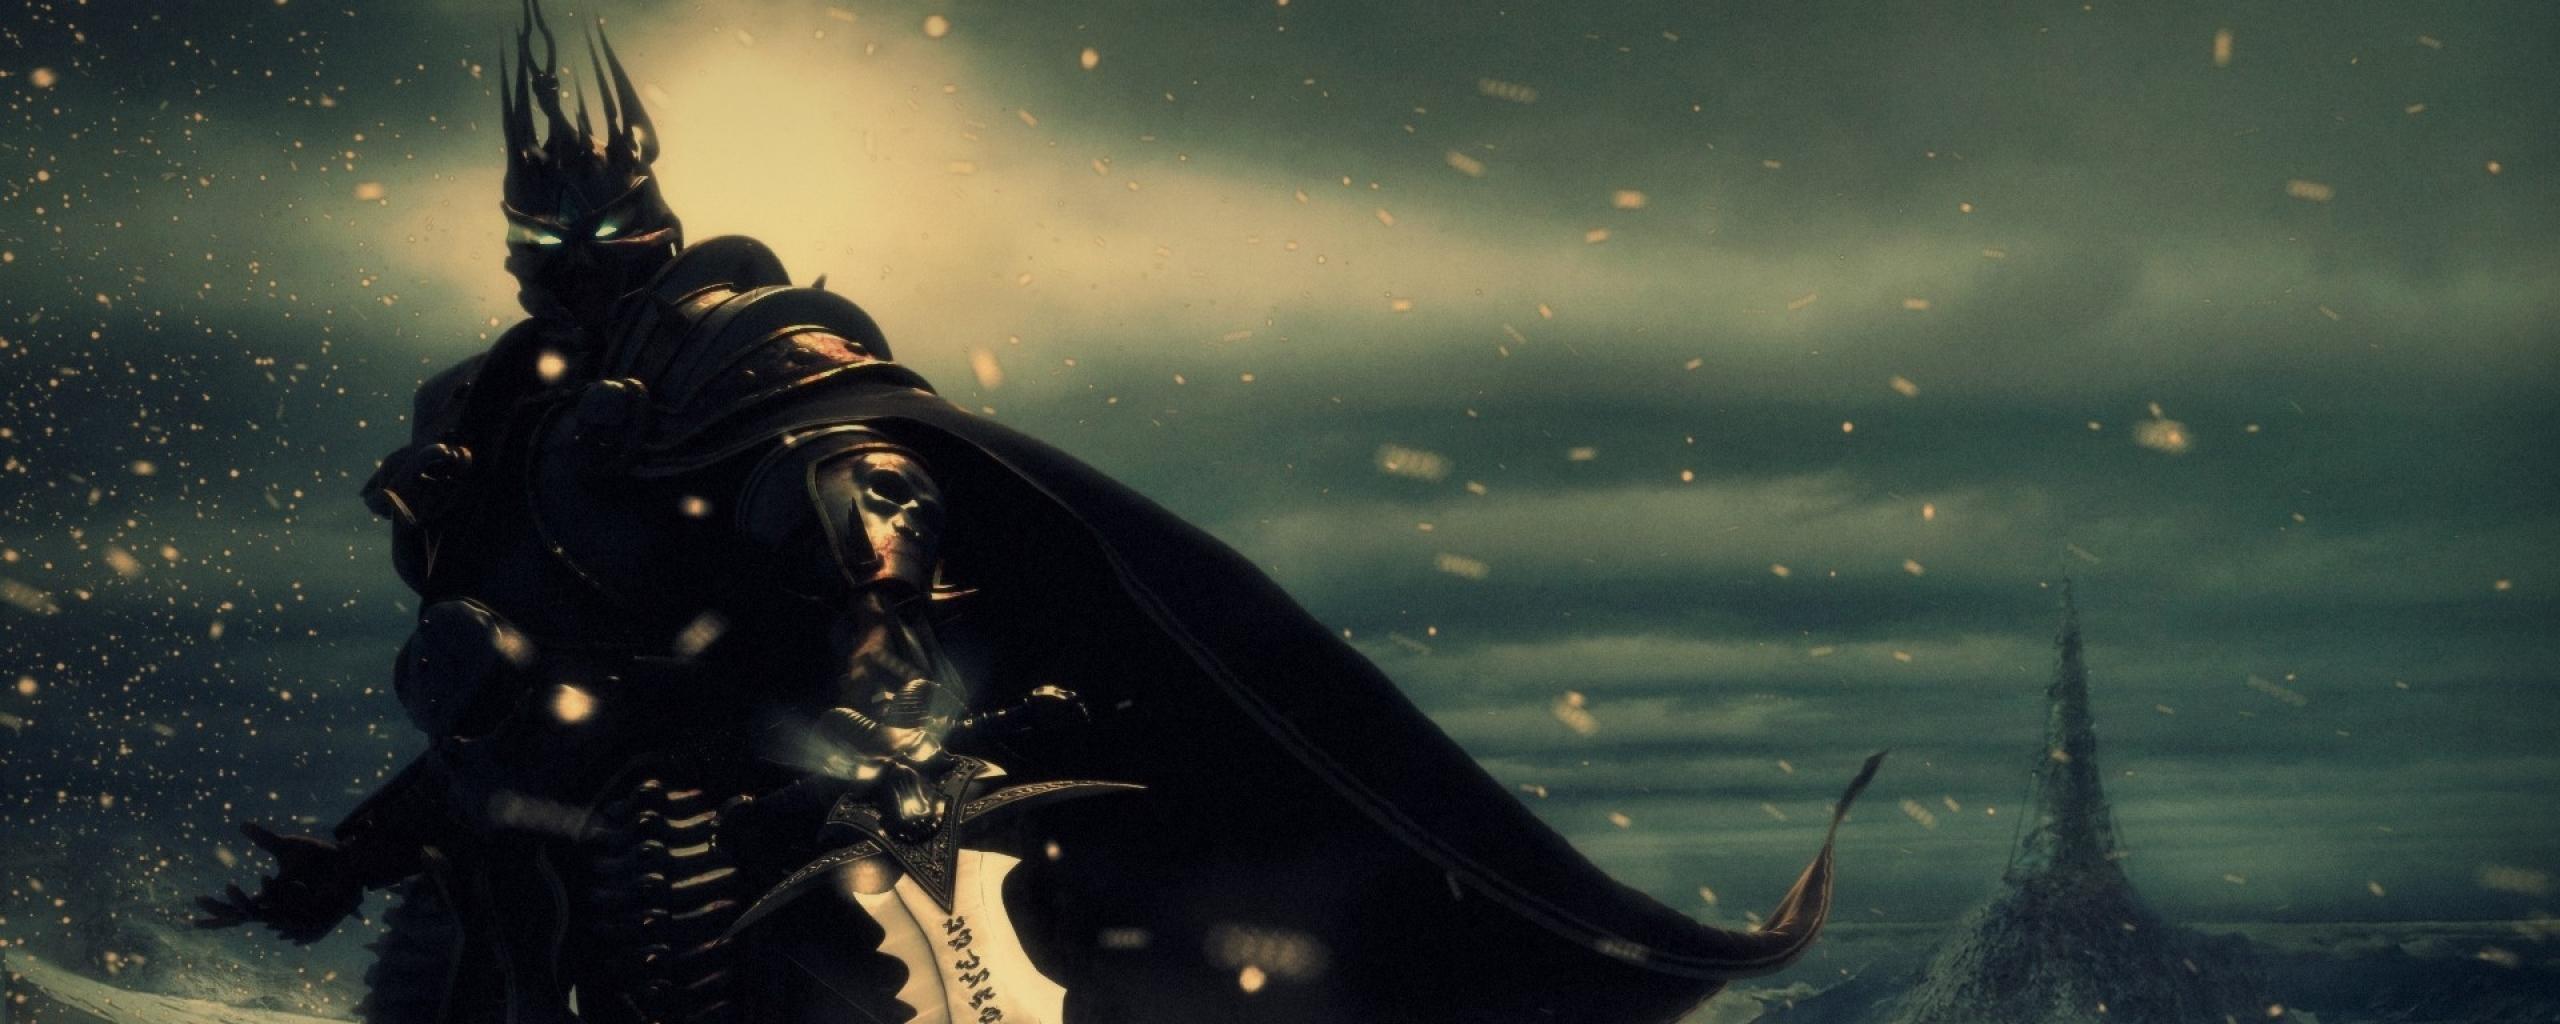 Download Wallpaper 2560x1024 World of warcraft, Blood elf, Energy